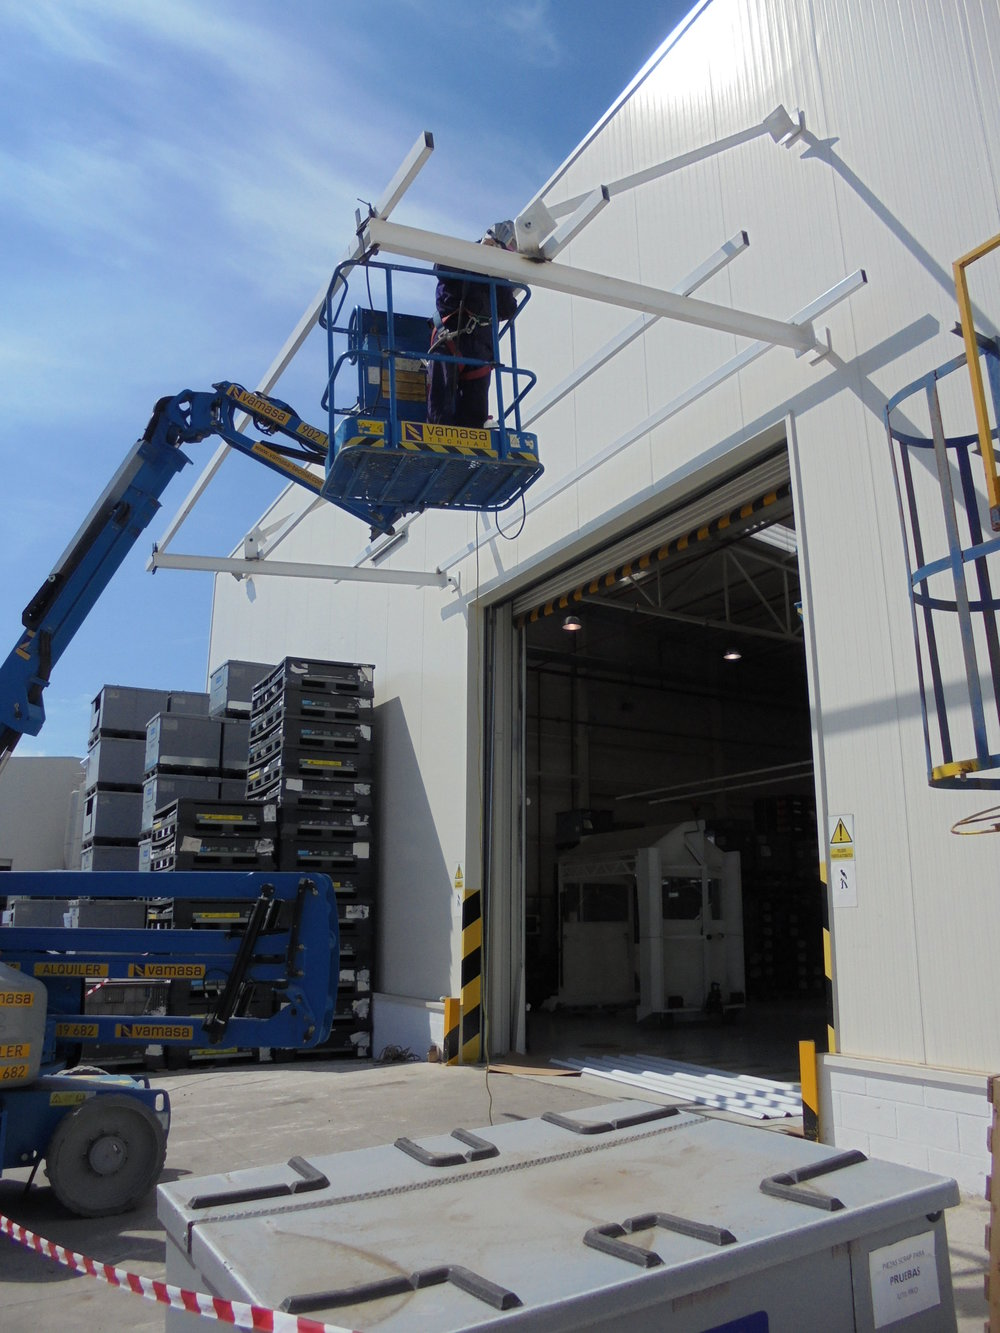 Construcción e instalación de marquesina sobre puerta en nave industrial